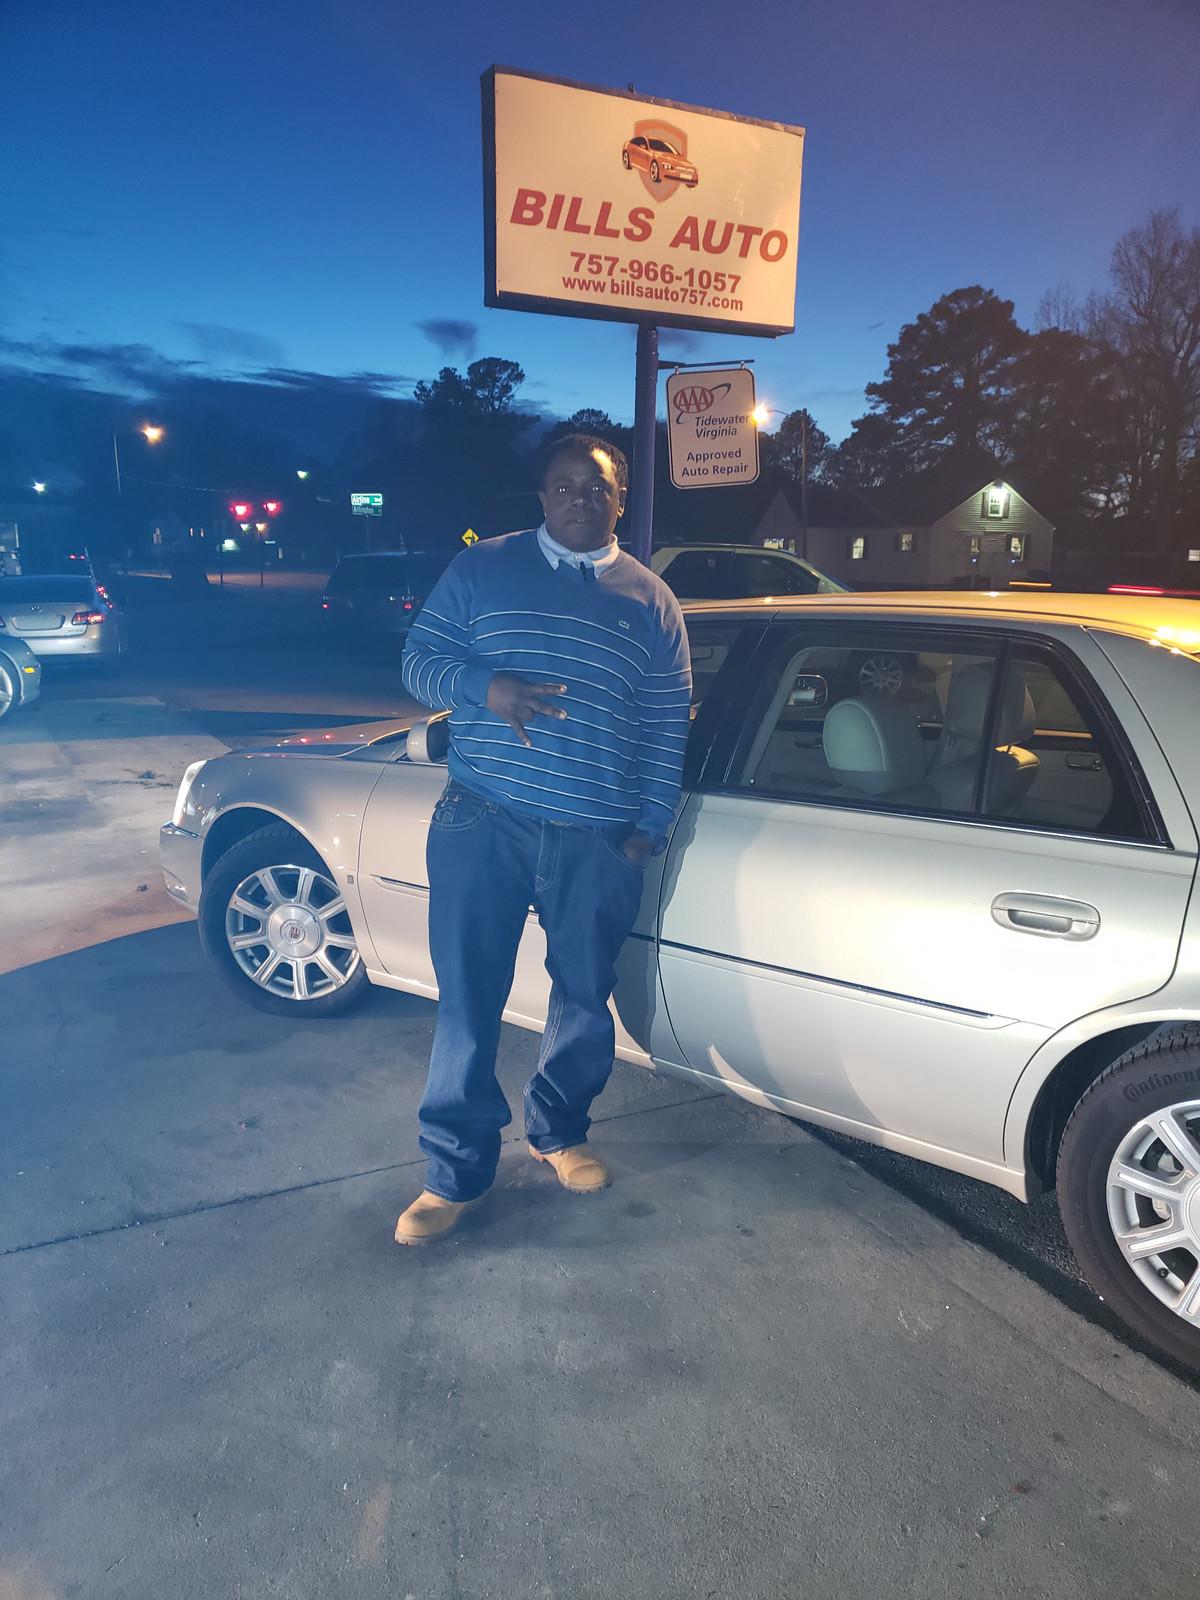 Bills Auto Sales >> Bills Auto Sales Fullscreen Page